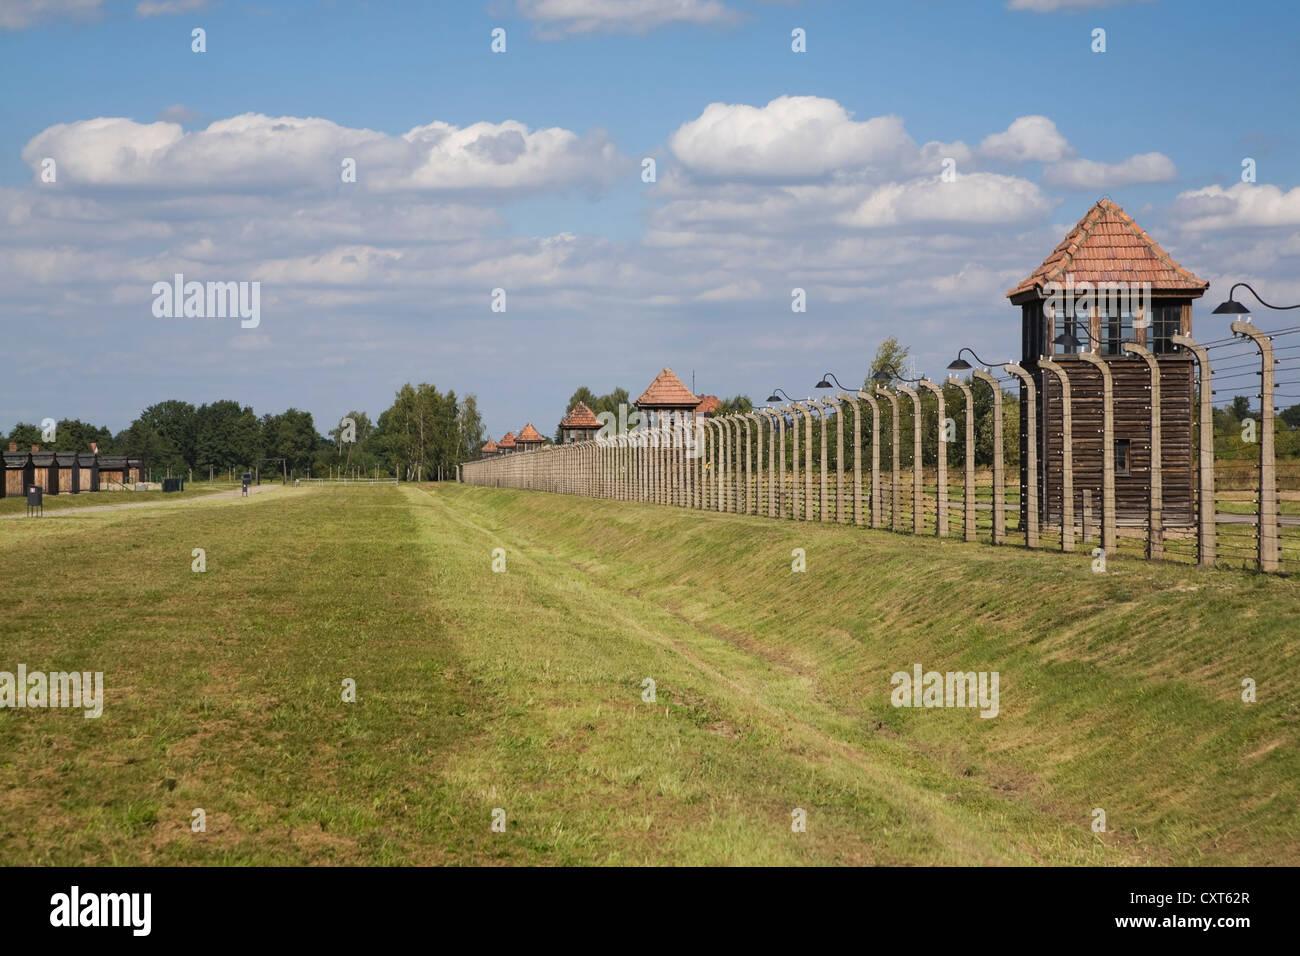 Barb wire electric fence surrounding the Auschwitz II-Birkenau former Nazi Concentration Camp, Auschwitz-Birkenau, - Stock Image